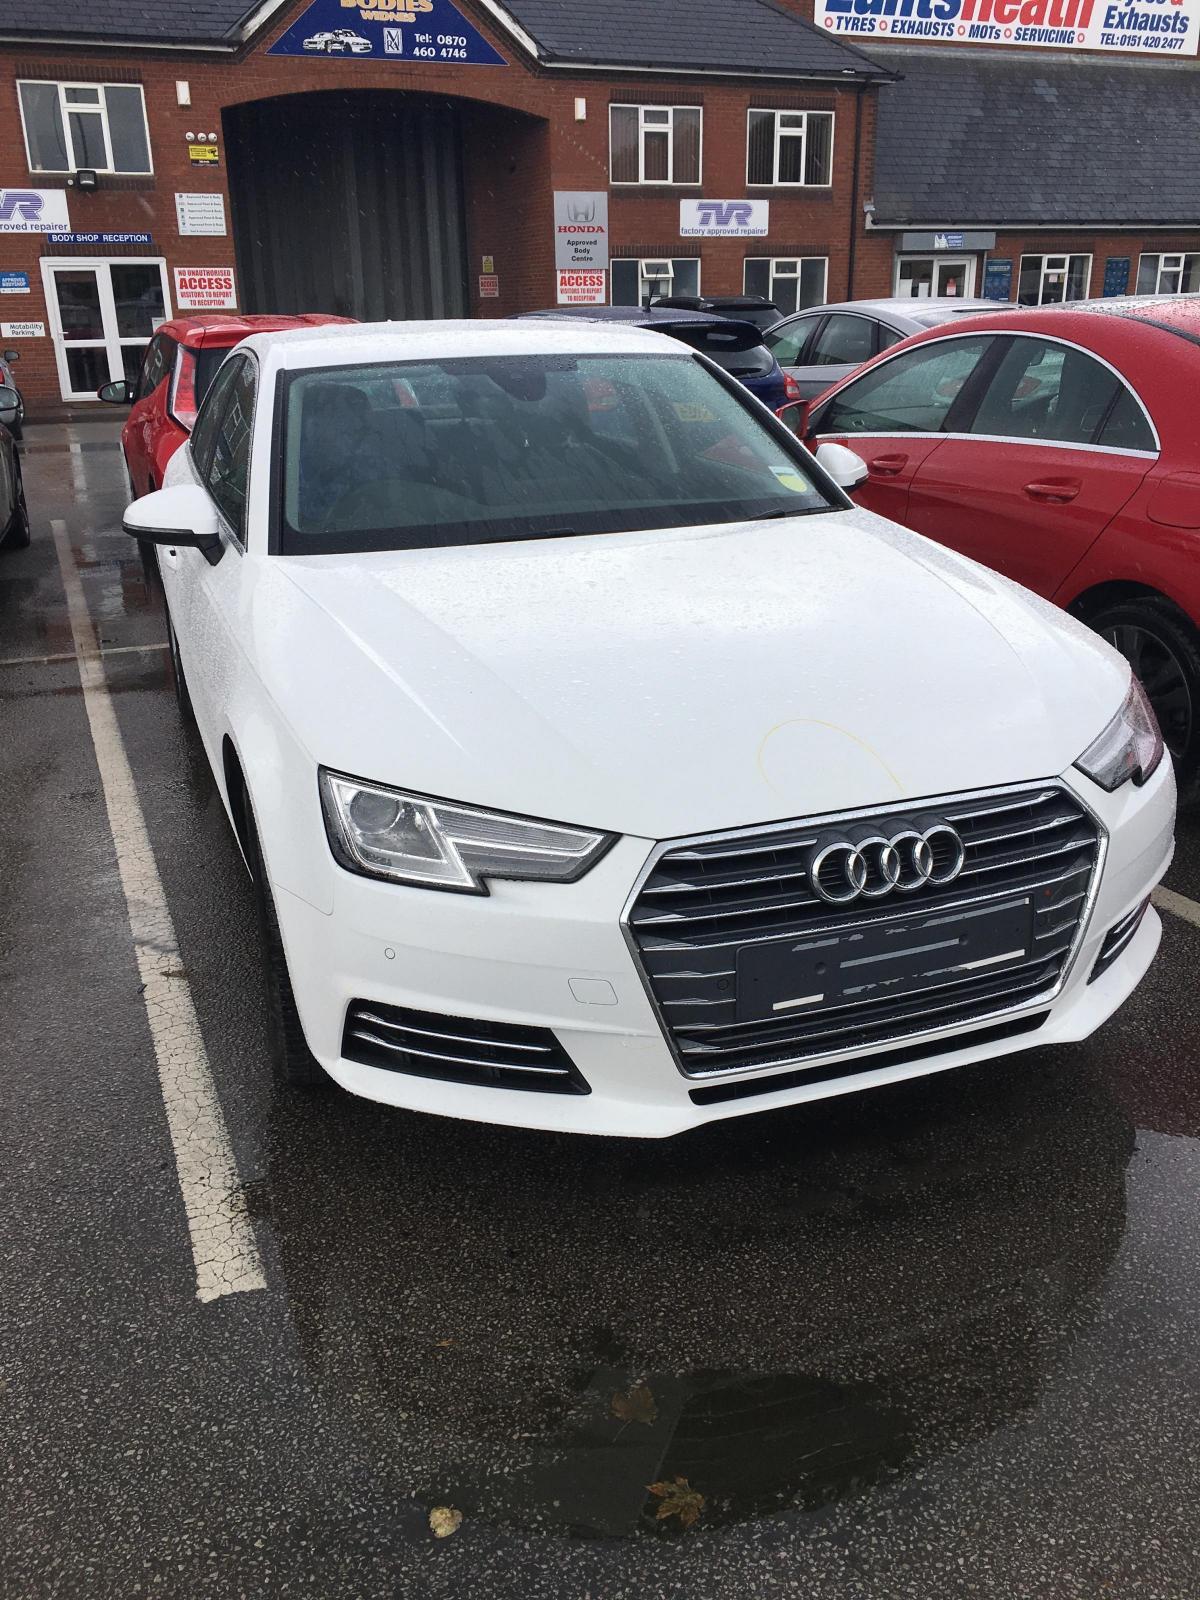 Audi Left At Manchester Airport Meet And Greet Parking Written Off